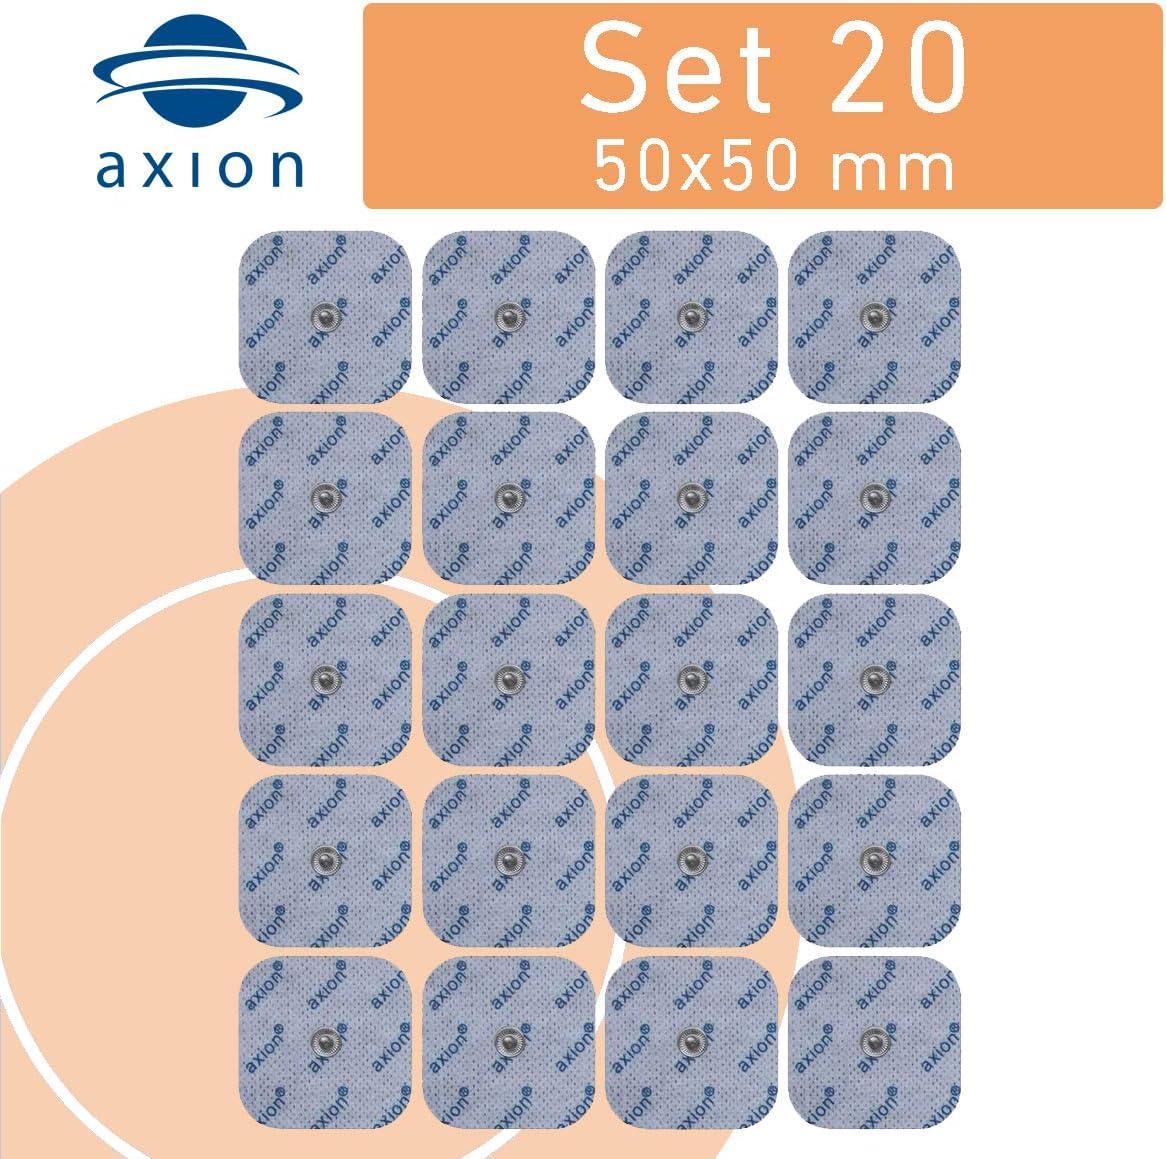 20 Electrodos de 5x5 cm - para su aparato TENS EMS electroestimulador VITALCONTROL & Beurer - axion